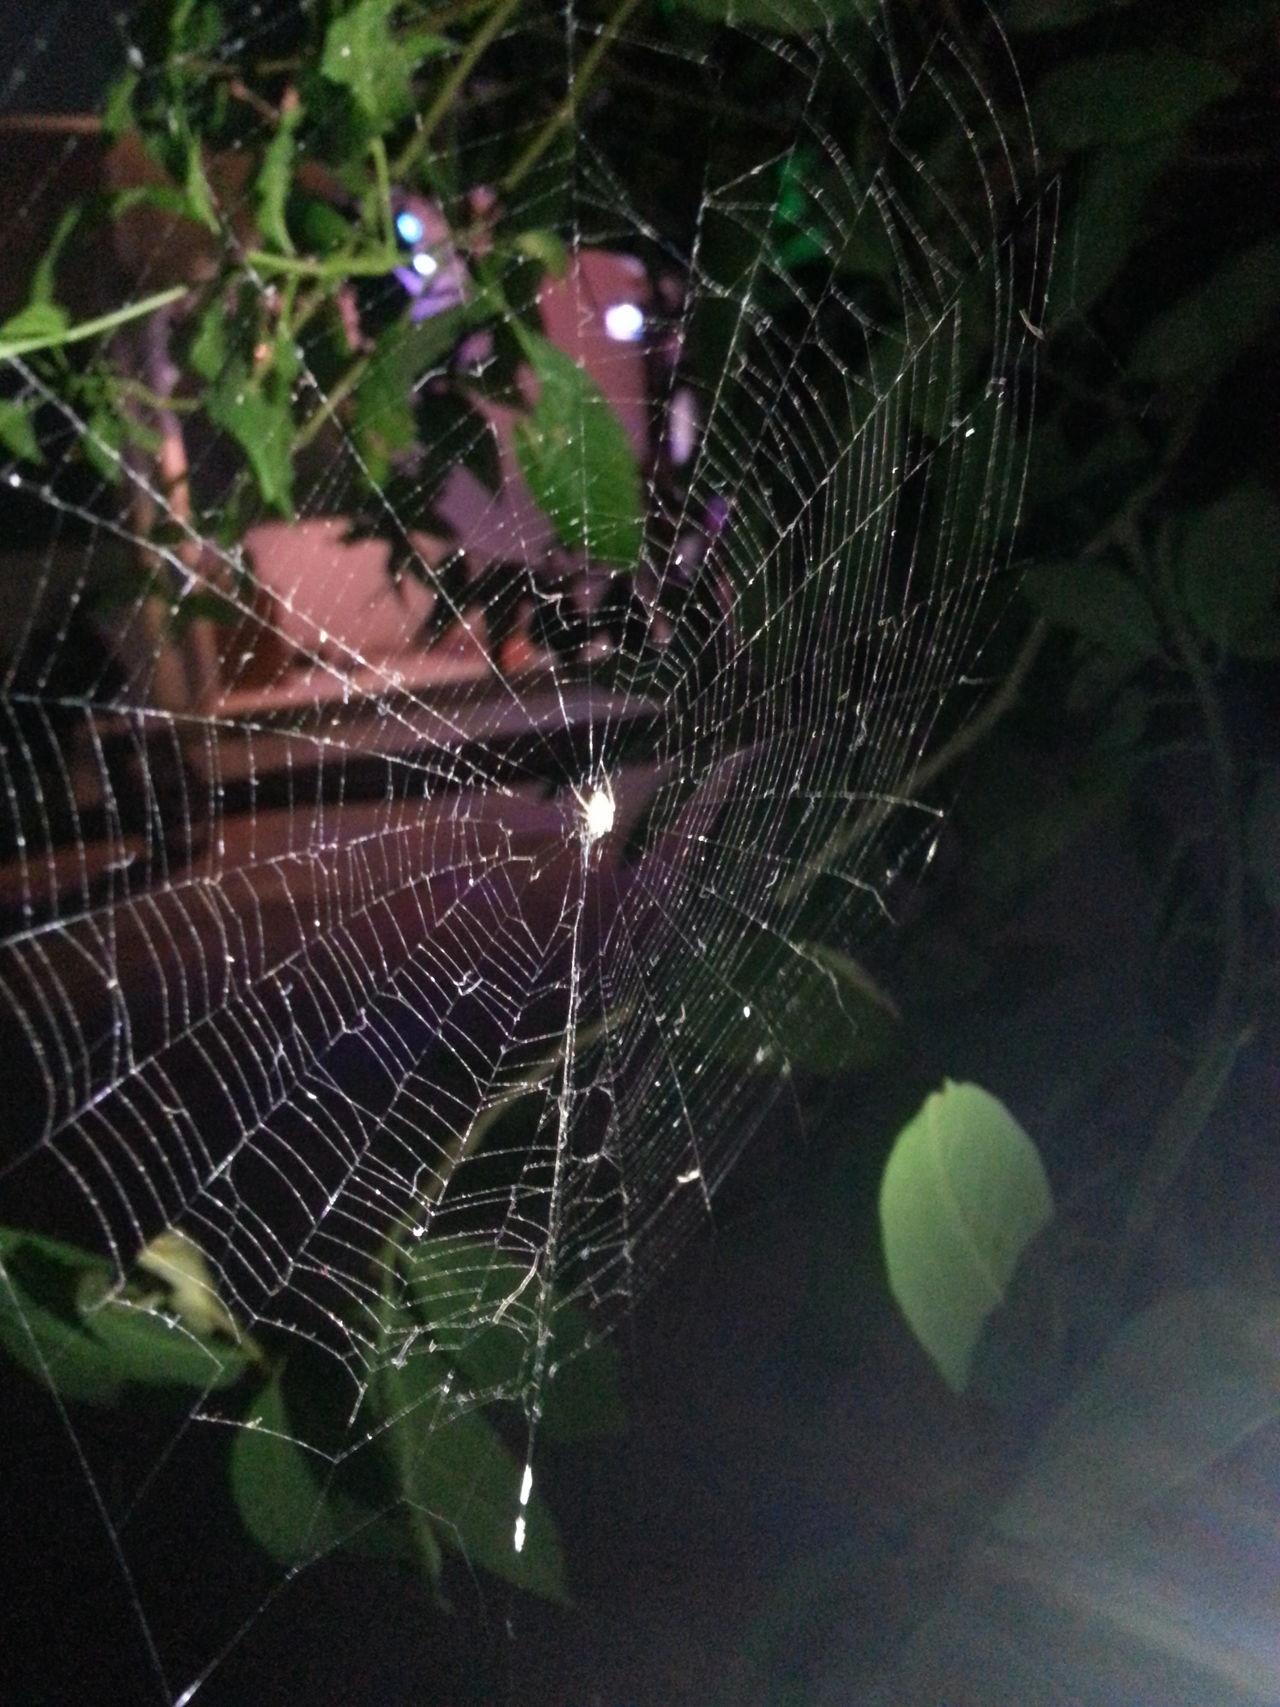 Spider Spider Web Close-up Flash Spiderworld Mobile_shot Mobile_photographer Night